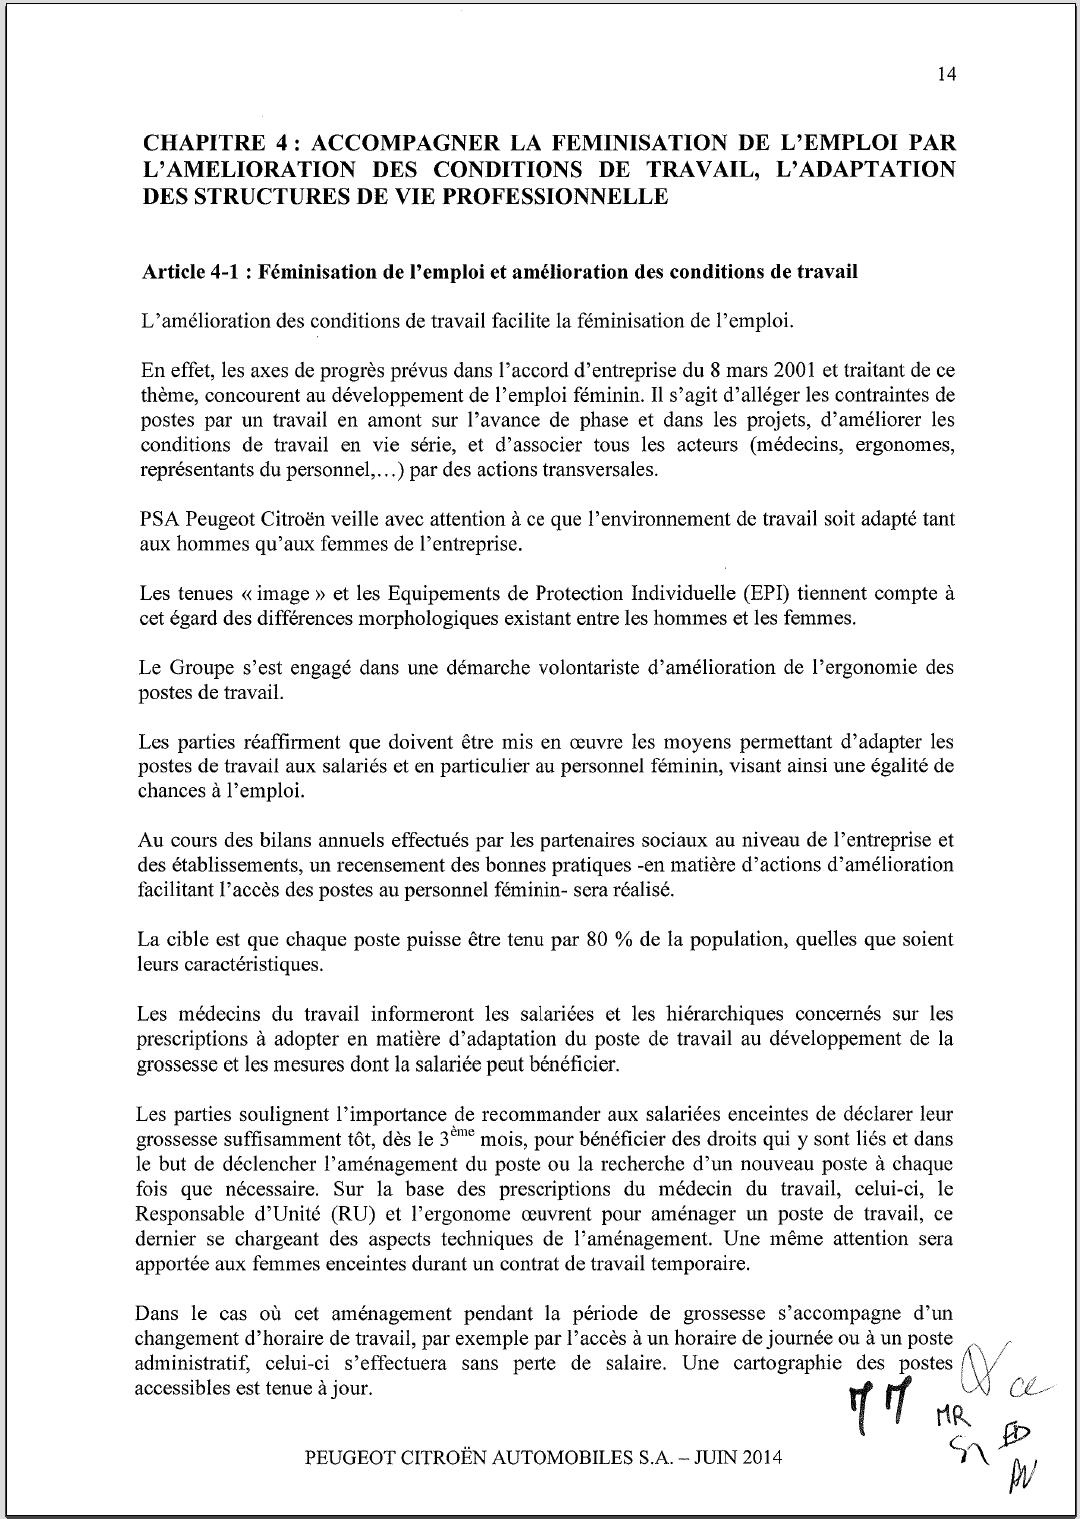 Accord14